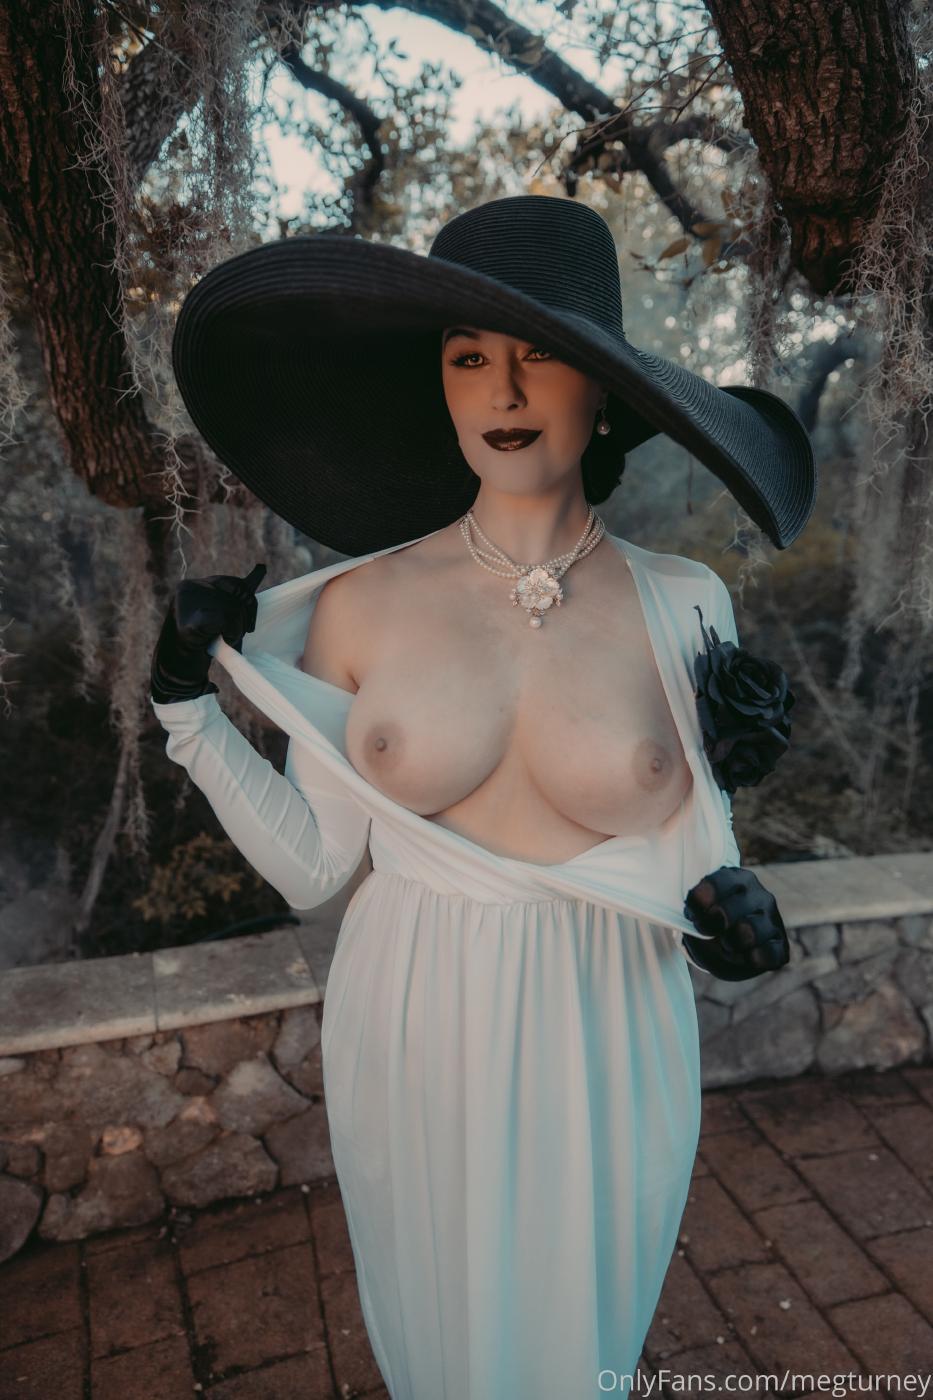 Meg Turney Lady Dimitrescu Cosplay Onlyfans Set Leaked 0033